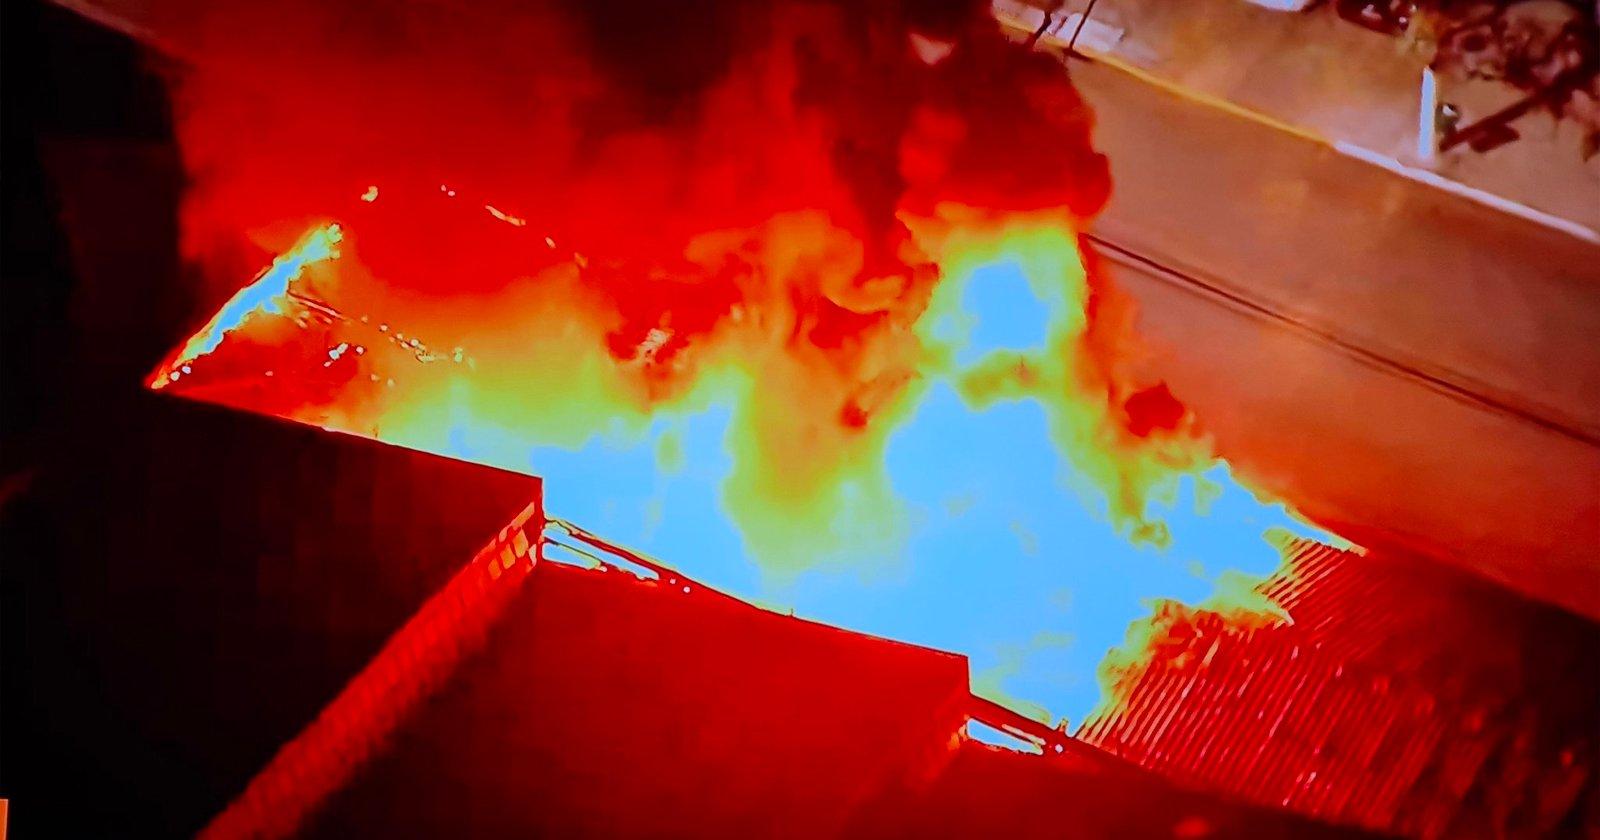 'Preventable' Fire Engulfs Major Brazilian Cinema Film History Archive